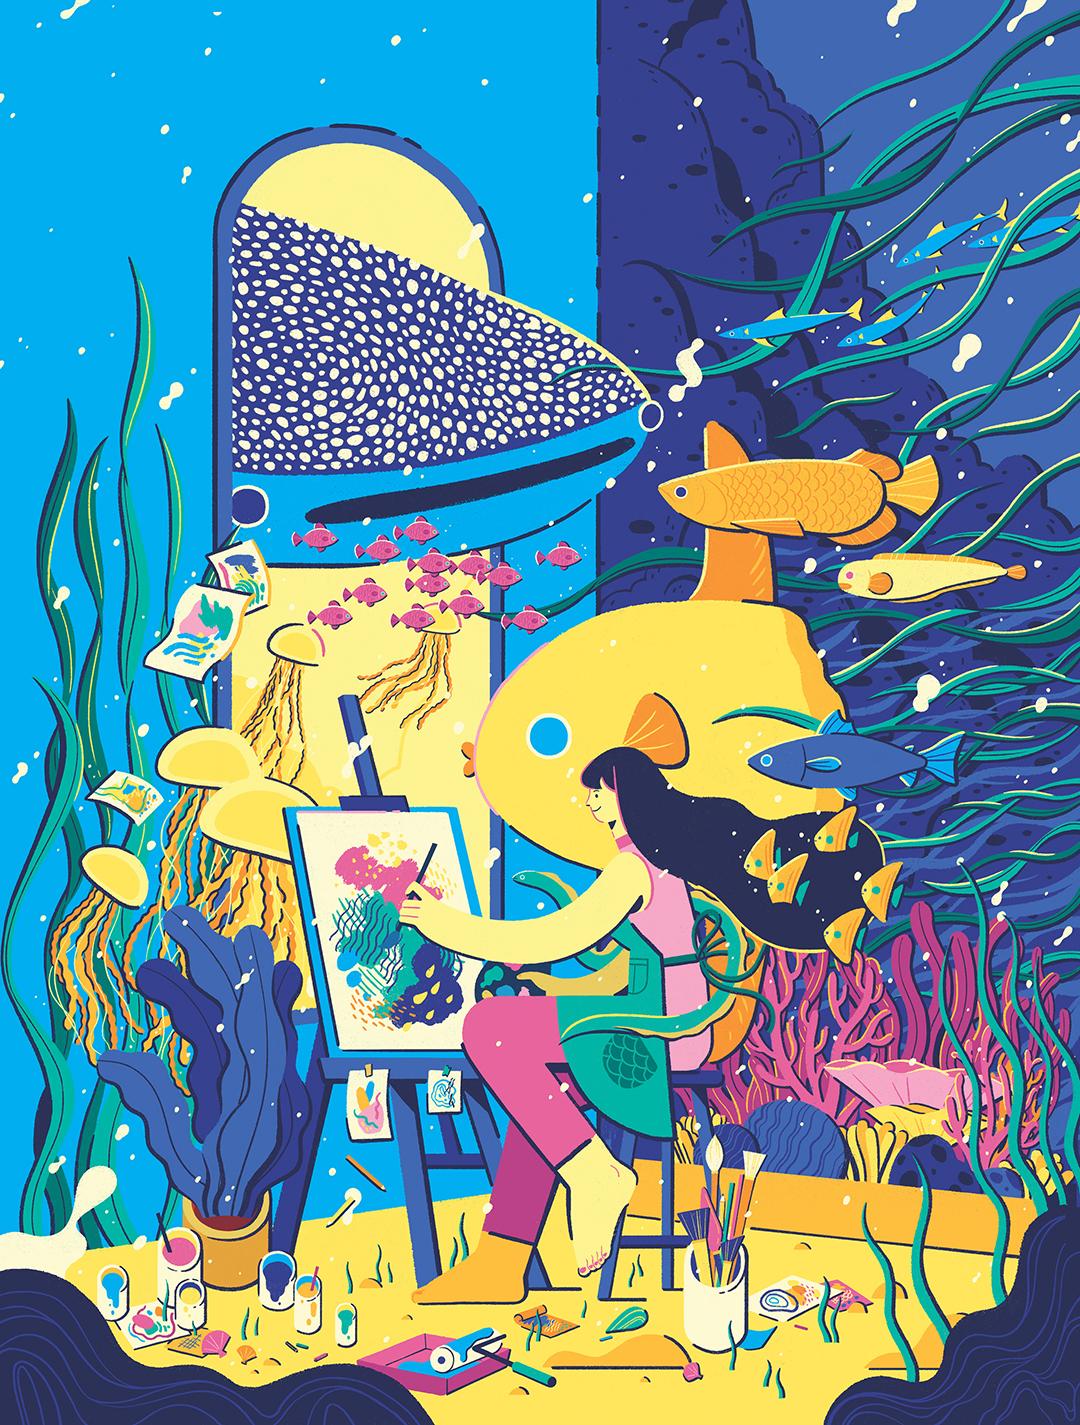 GirlsclubAsia-Illustrator-Lai Huili-002